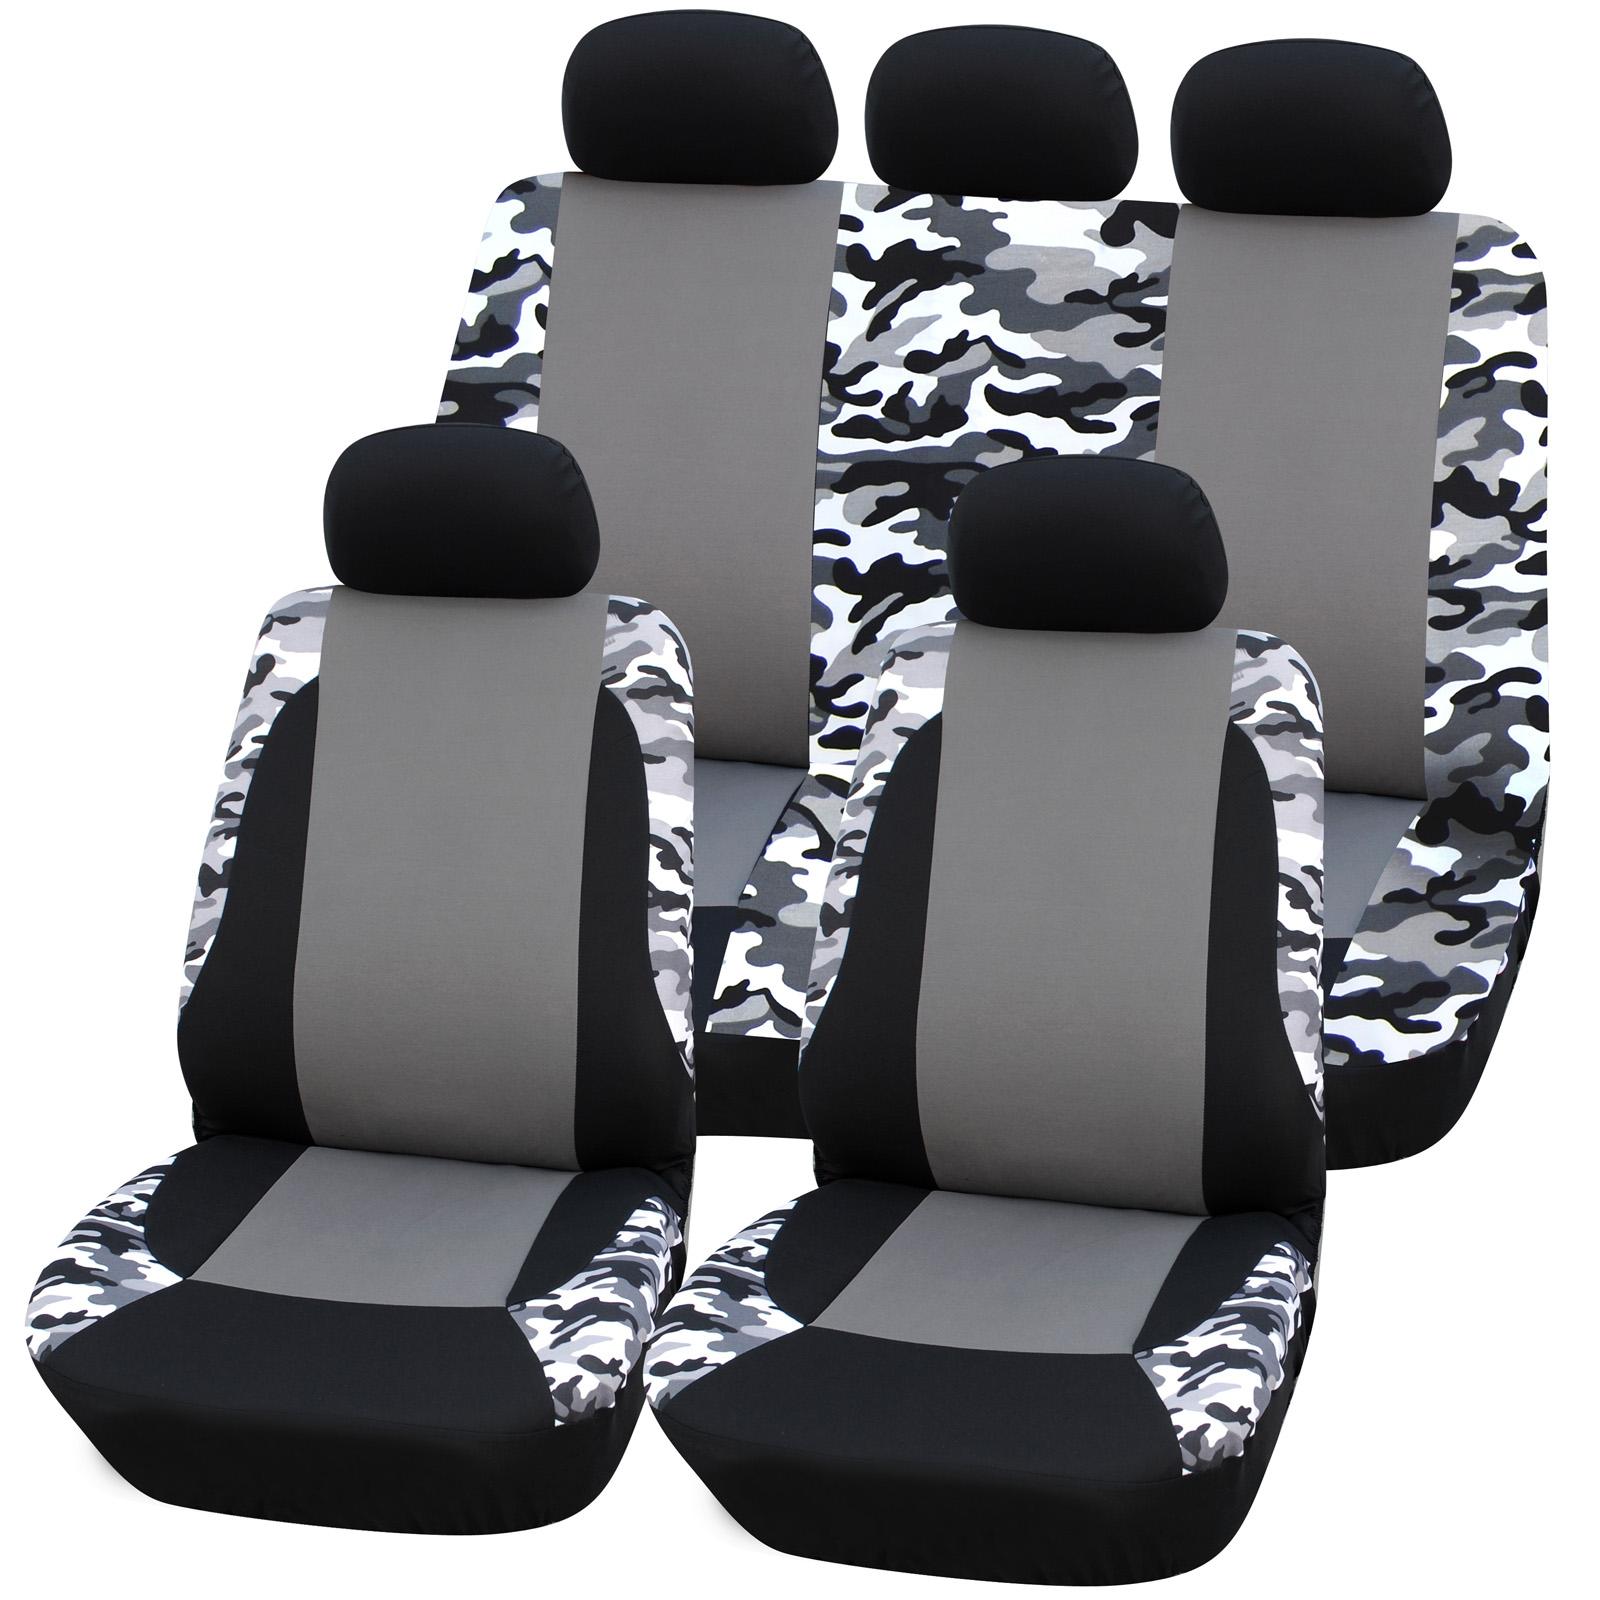 auto sitzbez ge sitzbezug schoner f r pkw ohne seitenairbag schwarz grau as7309 ebay. Black Bedroom Furniture Sets. Home Design Ideas